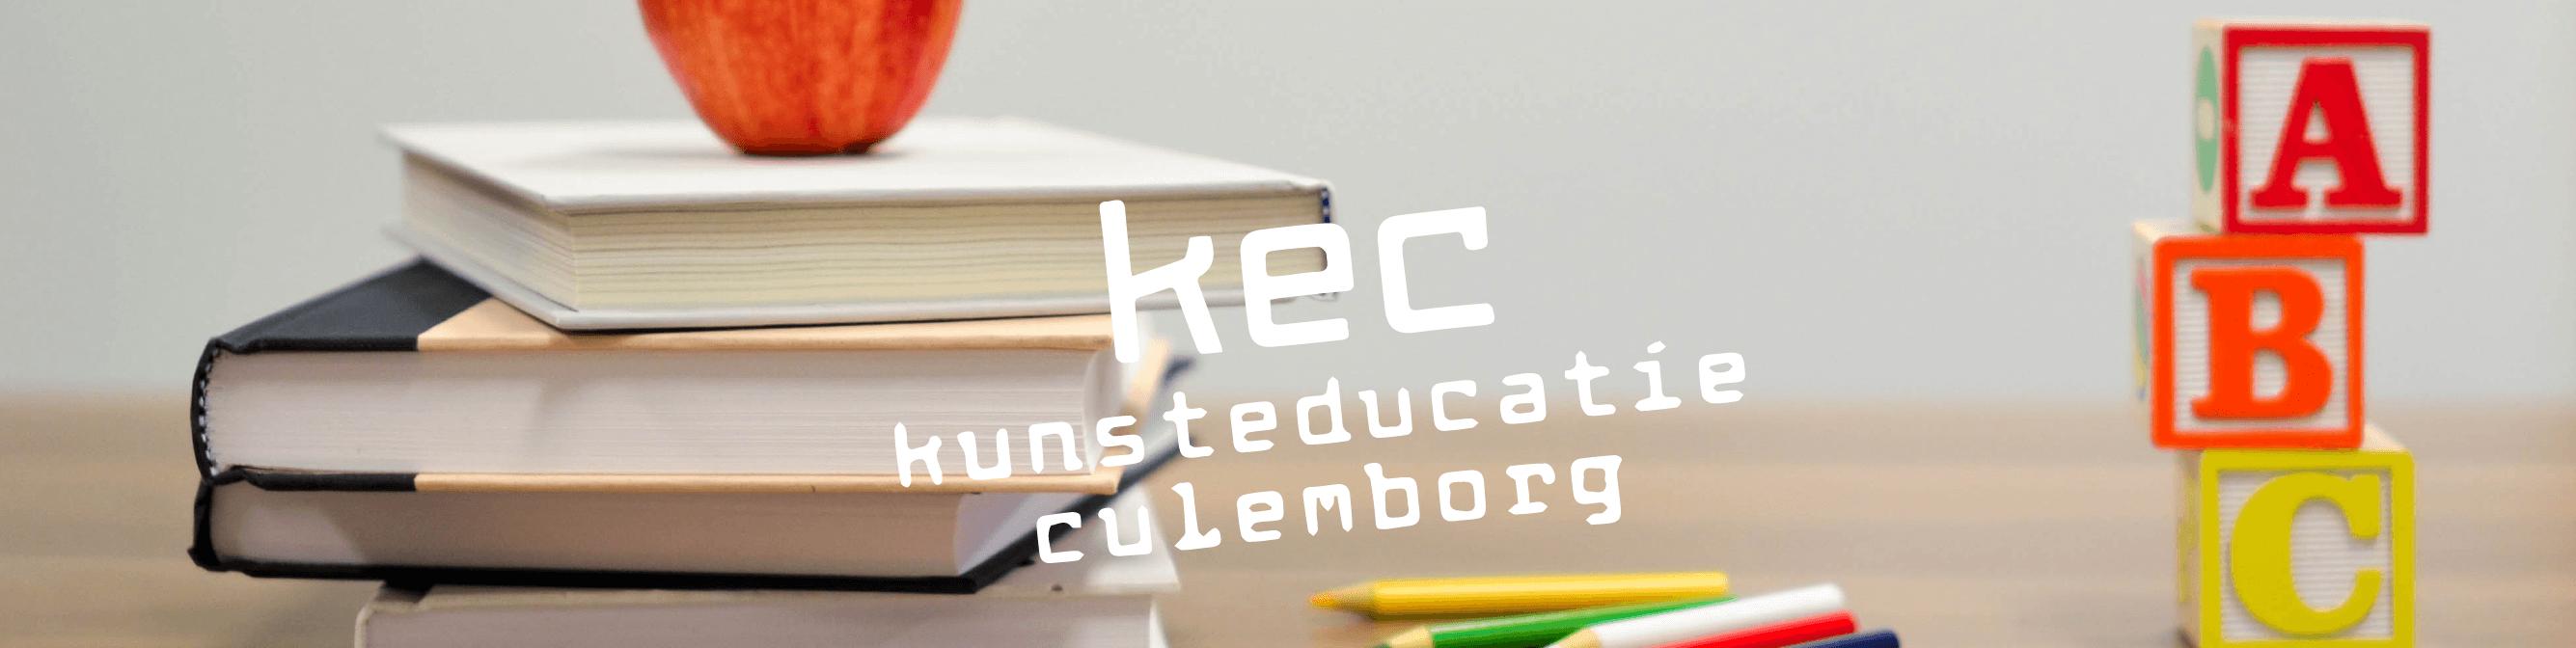 Banner KEC Kunsteducatie Culemborg